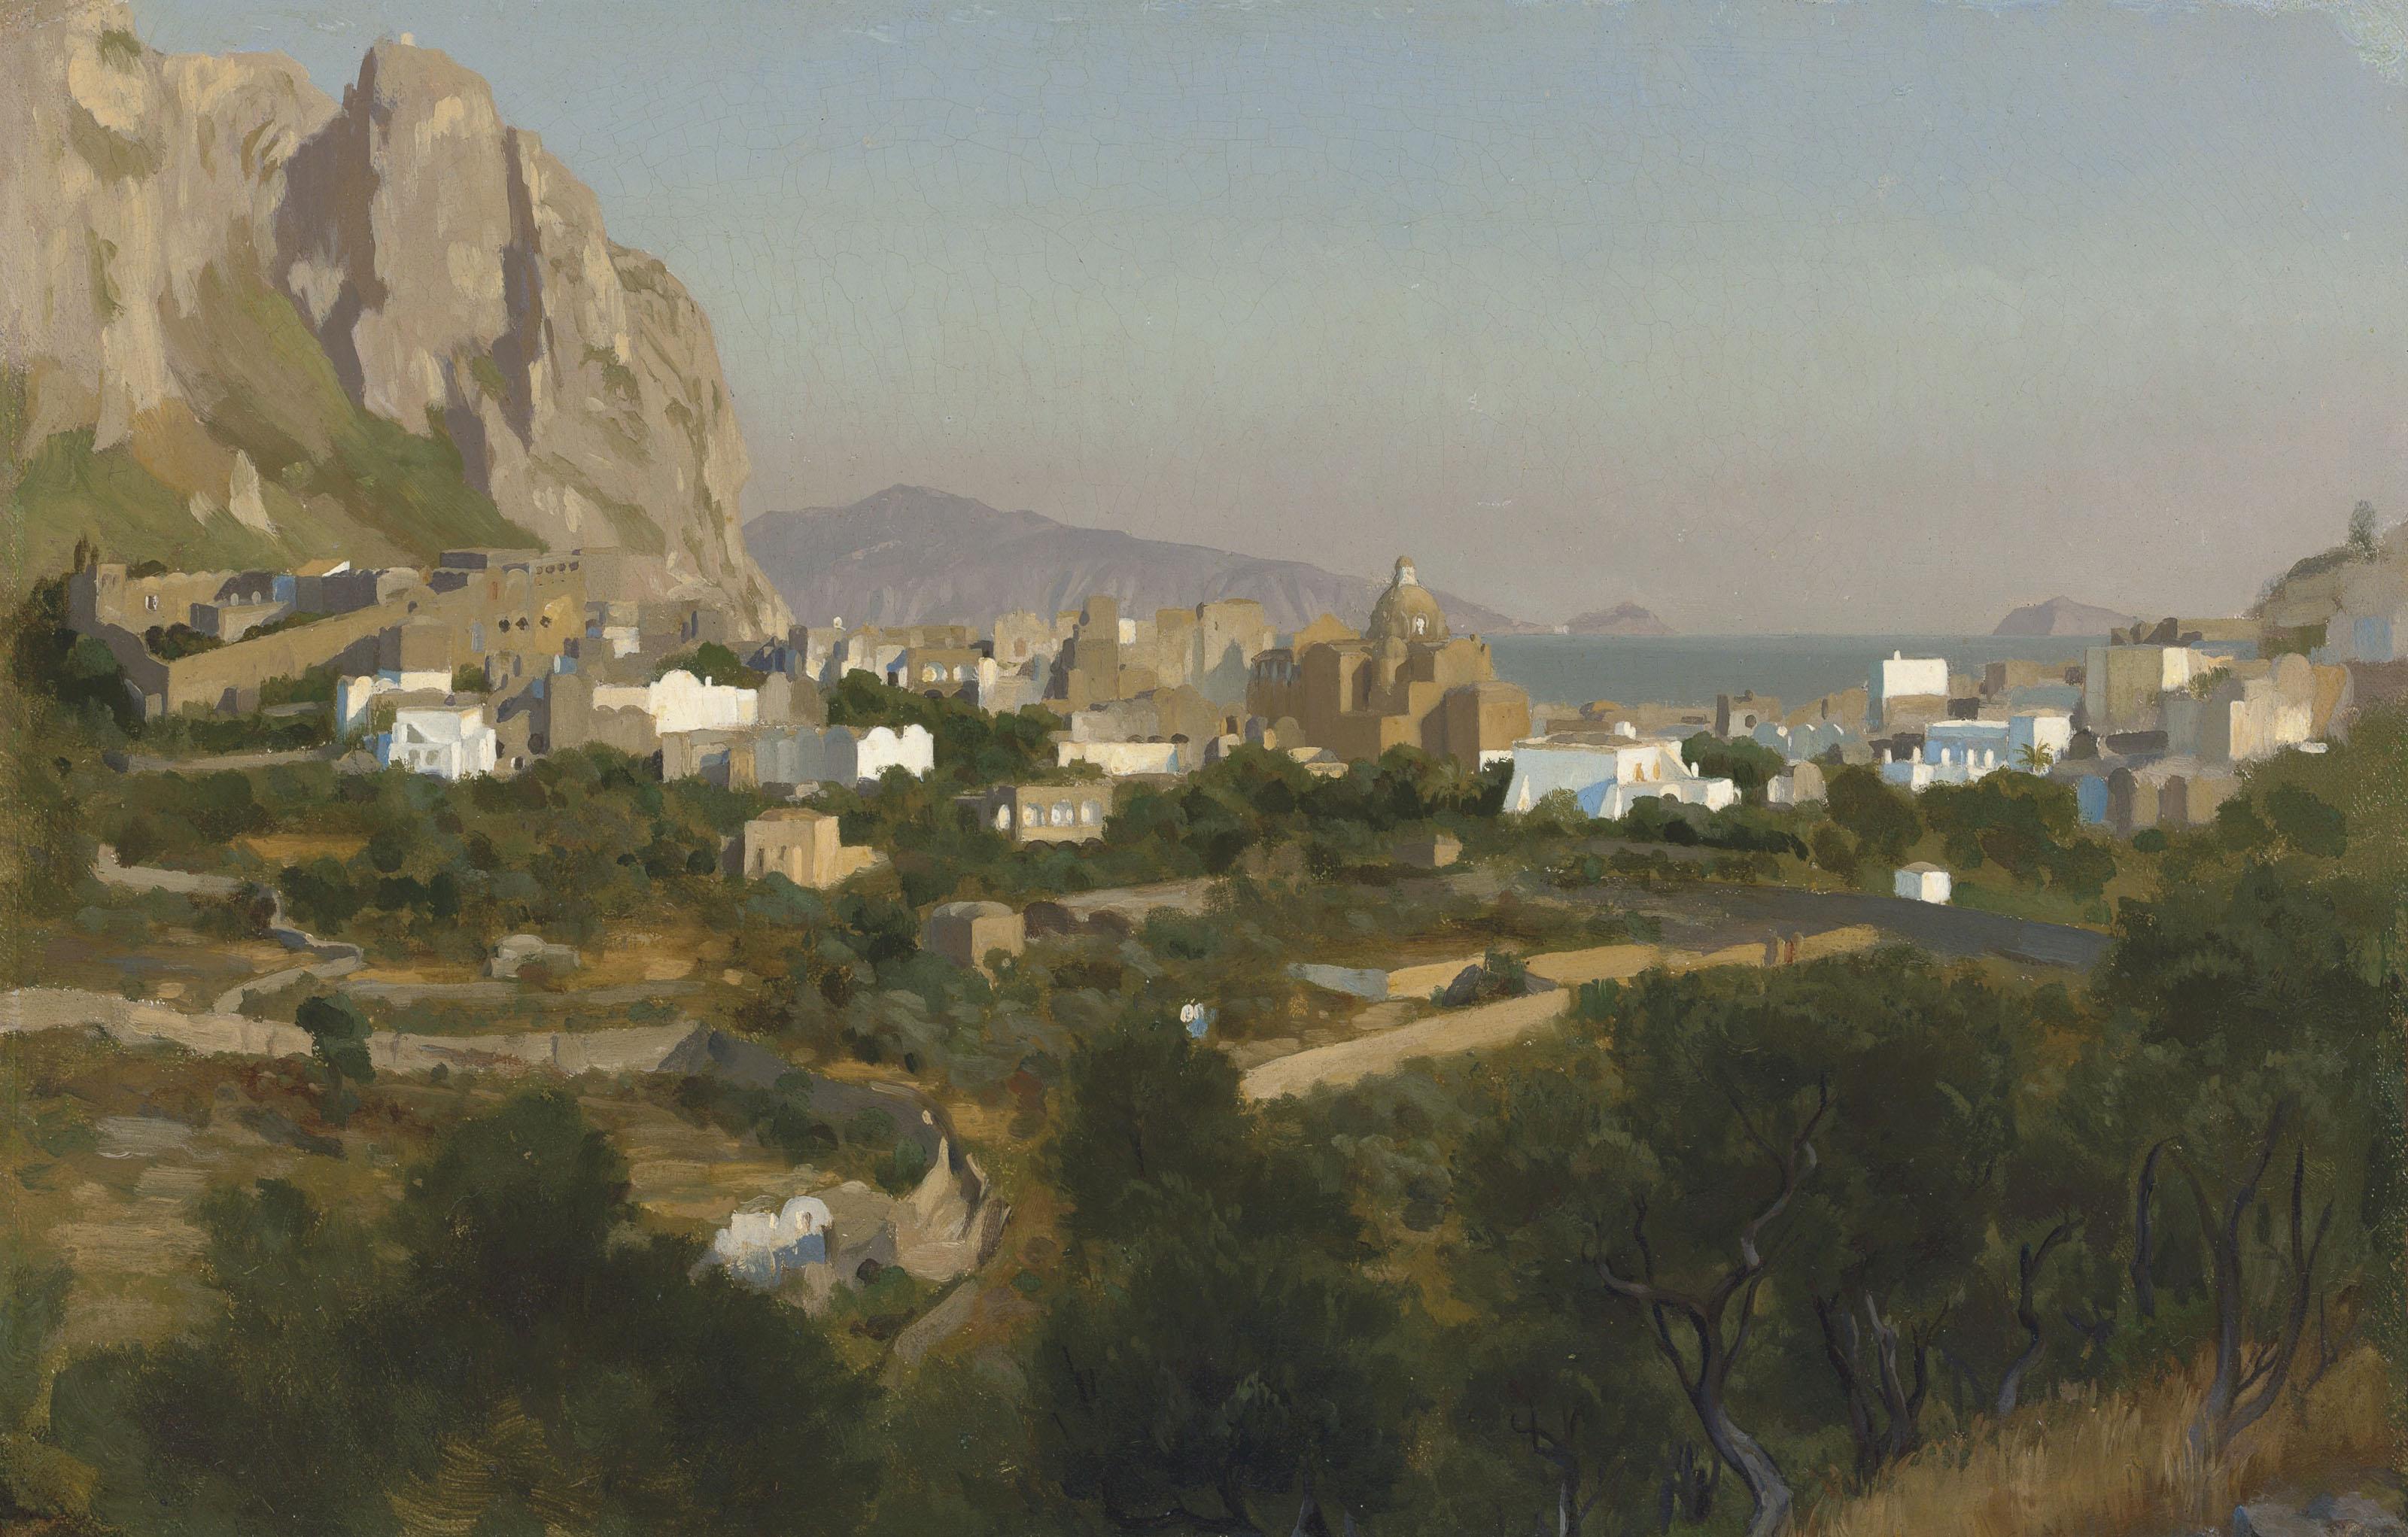 Frederic, Lord Leighton, P.R.A. (British, 1830-1896)